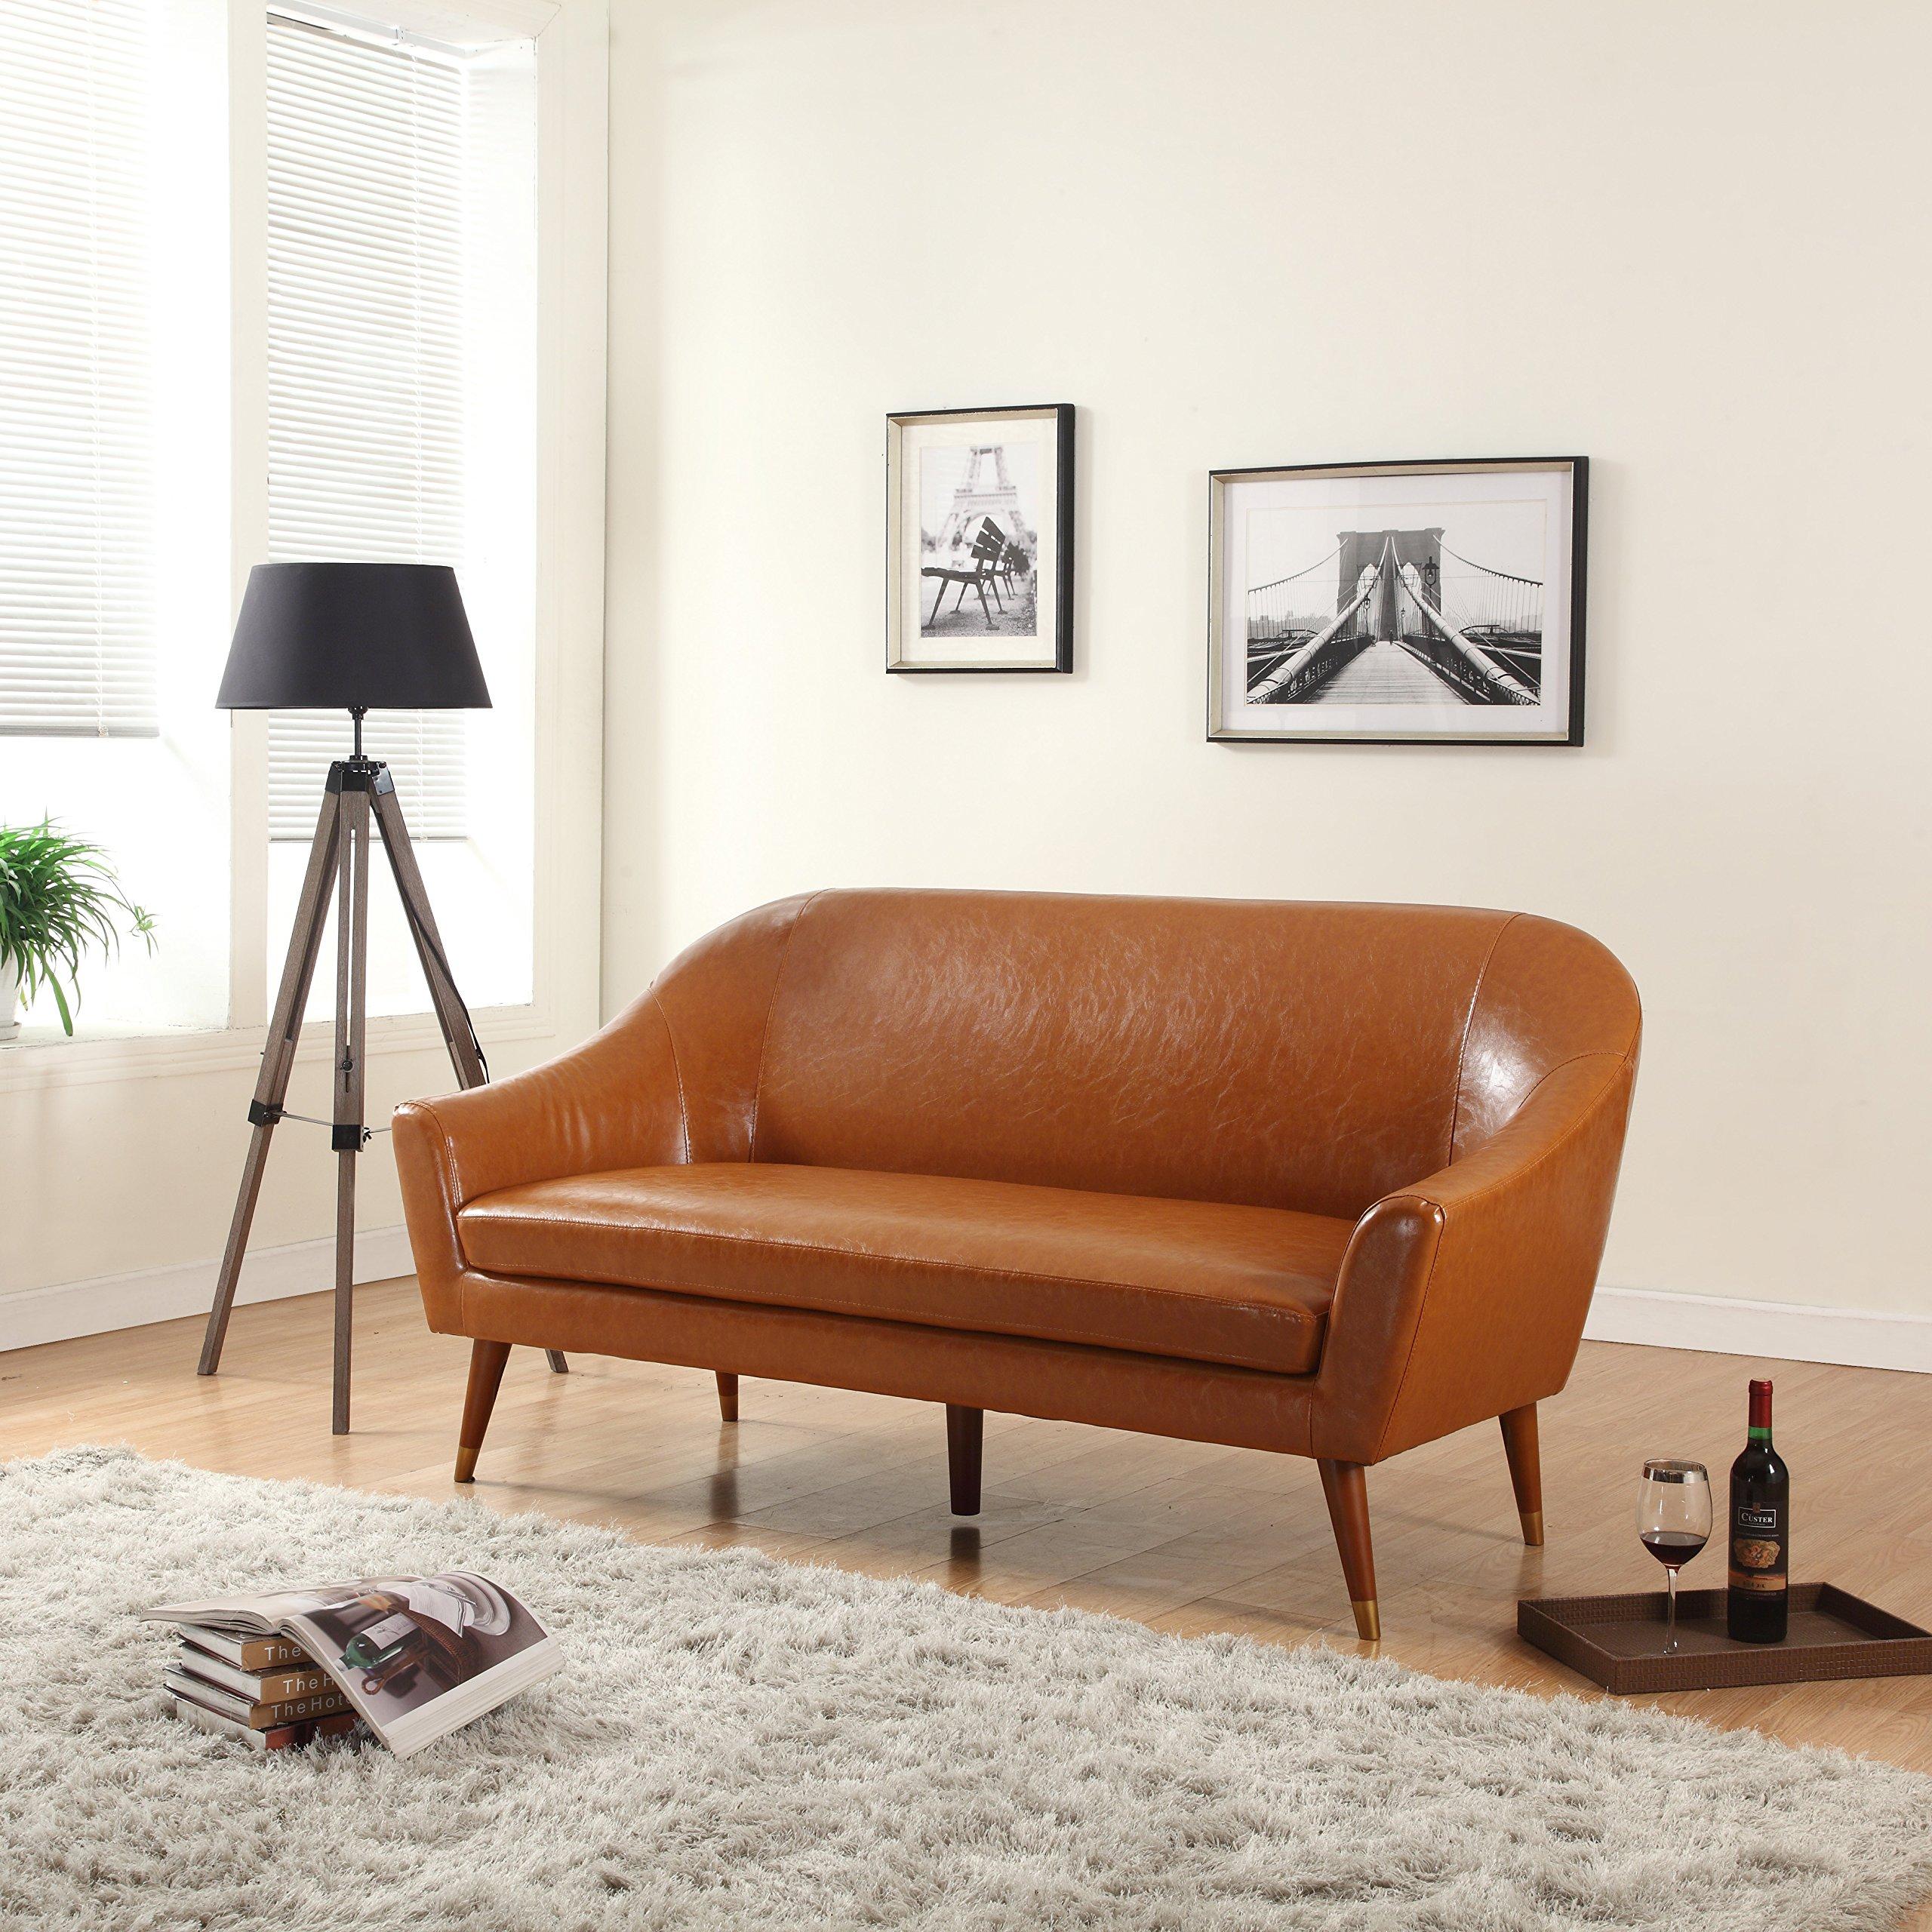 Buy Divano Roma Furniture - Mid Century Modern Sofa - Bonded Leather ...